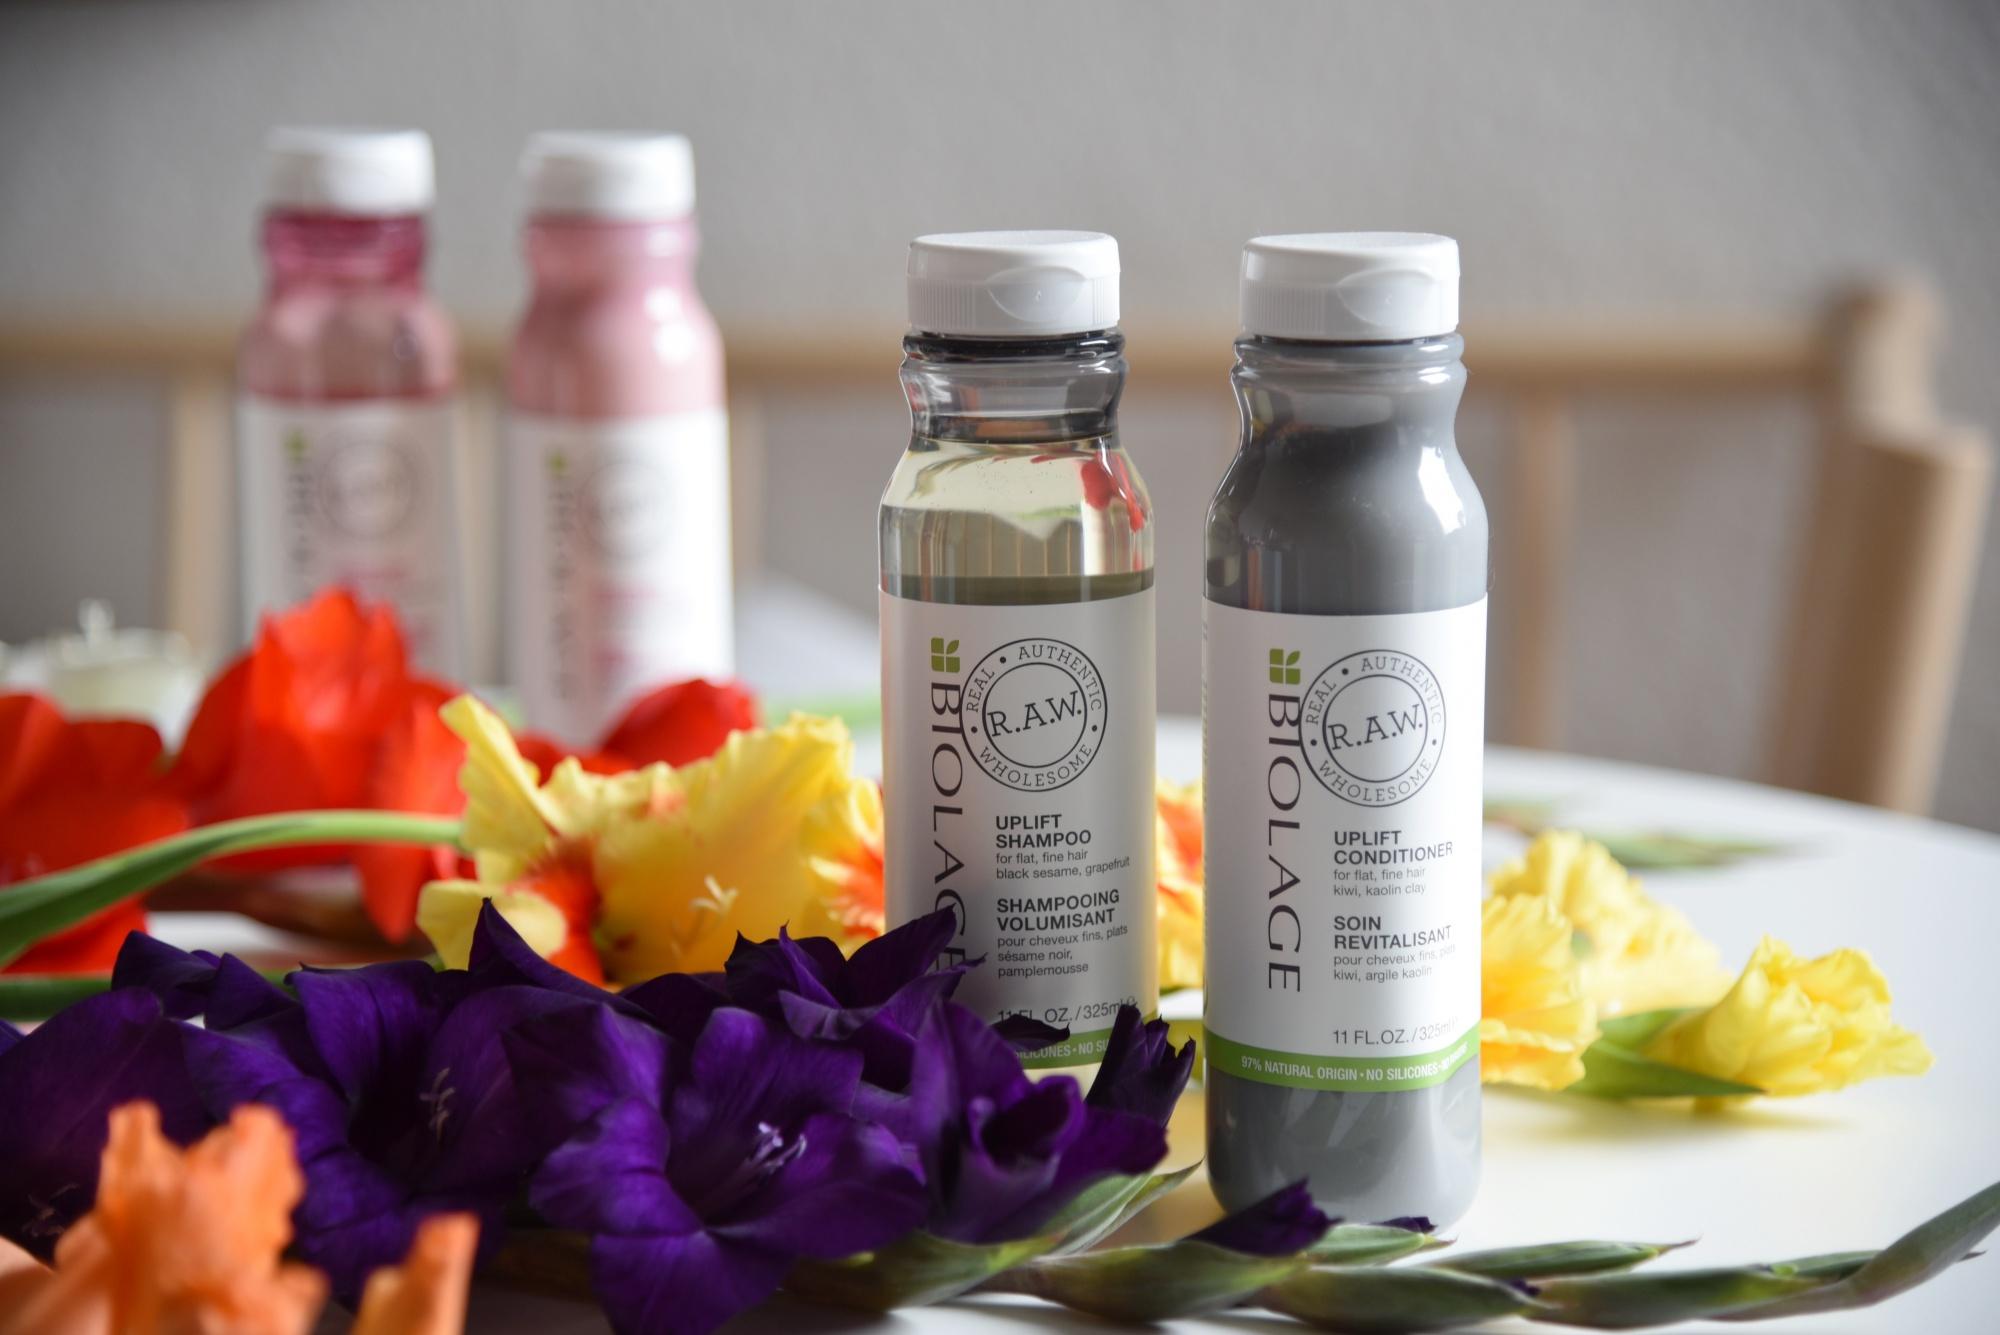 biolage shampoo oh wunderbar blog family fashion lifestyle travel. Black Bedroom Furniture Sets. Home Design Ideas